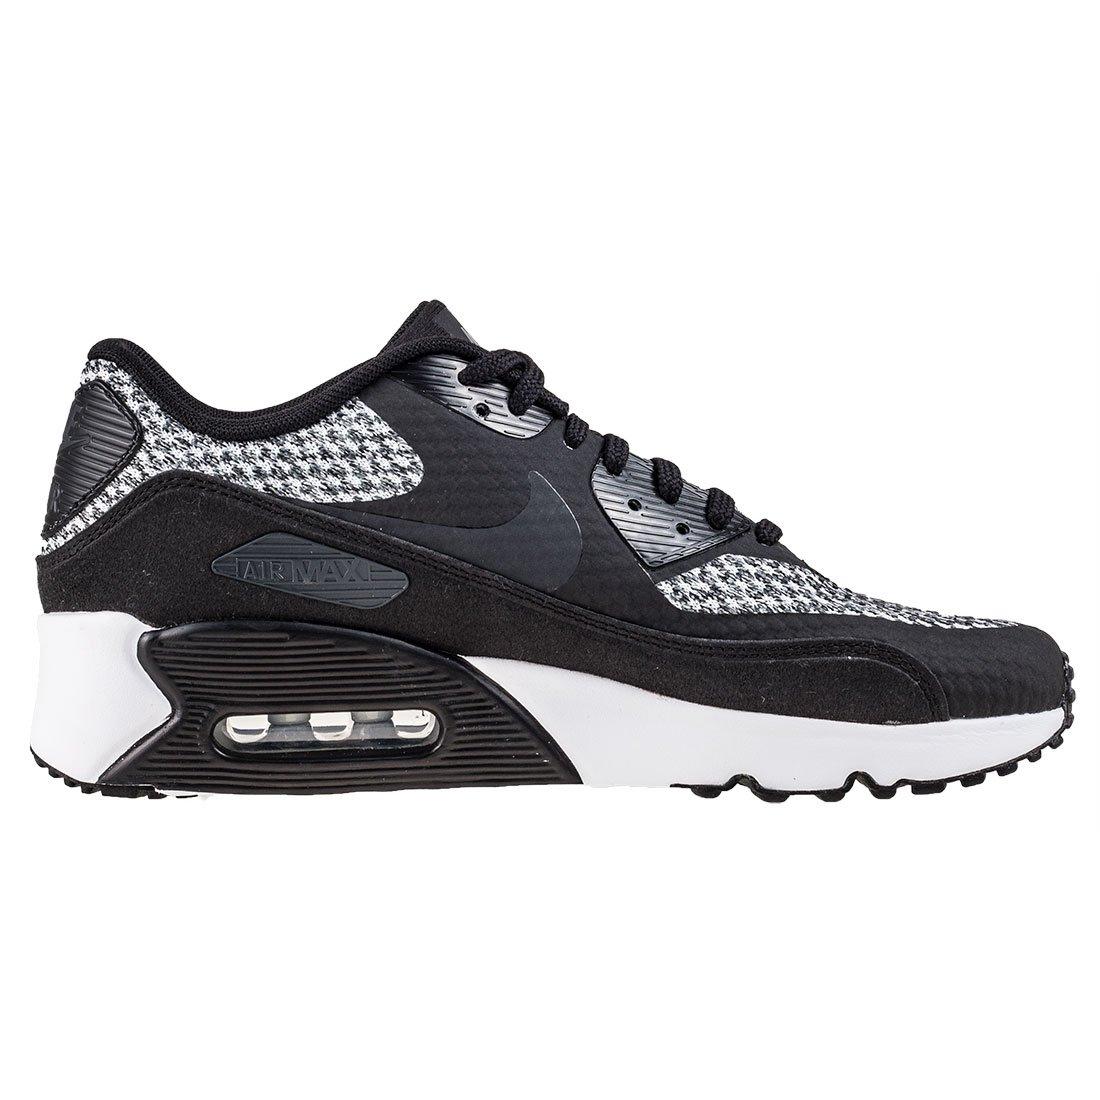 Nike Air Max 90 Ultra 2.0 SE 917988005, Turnschuhe